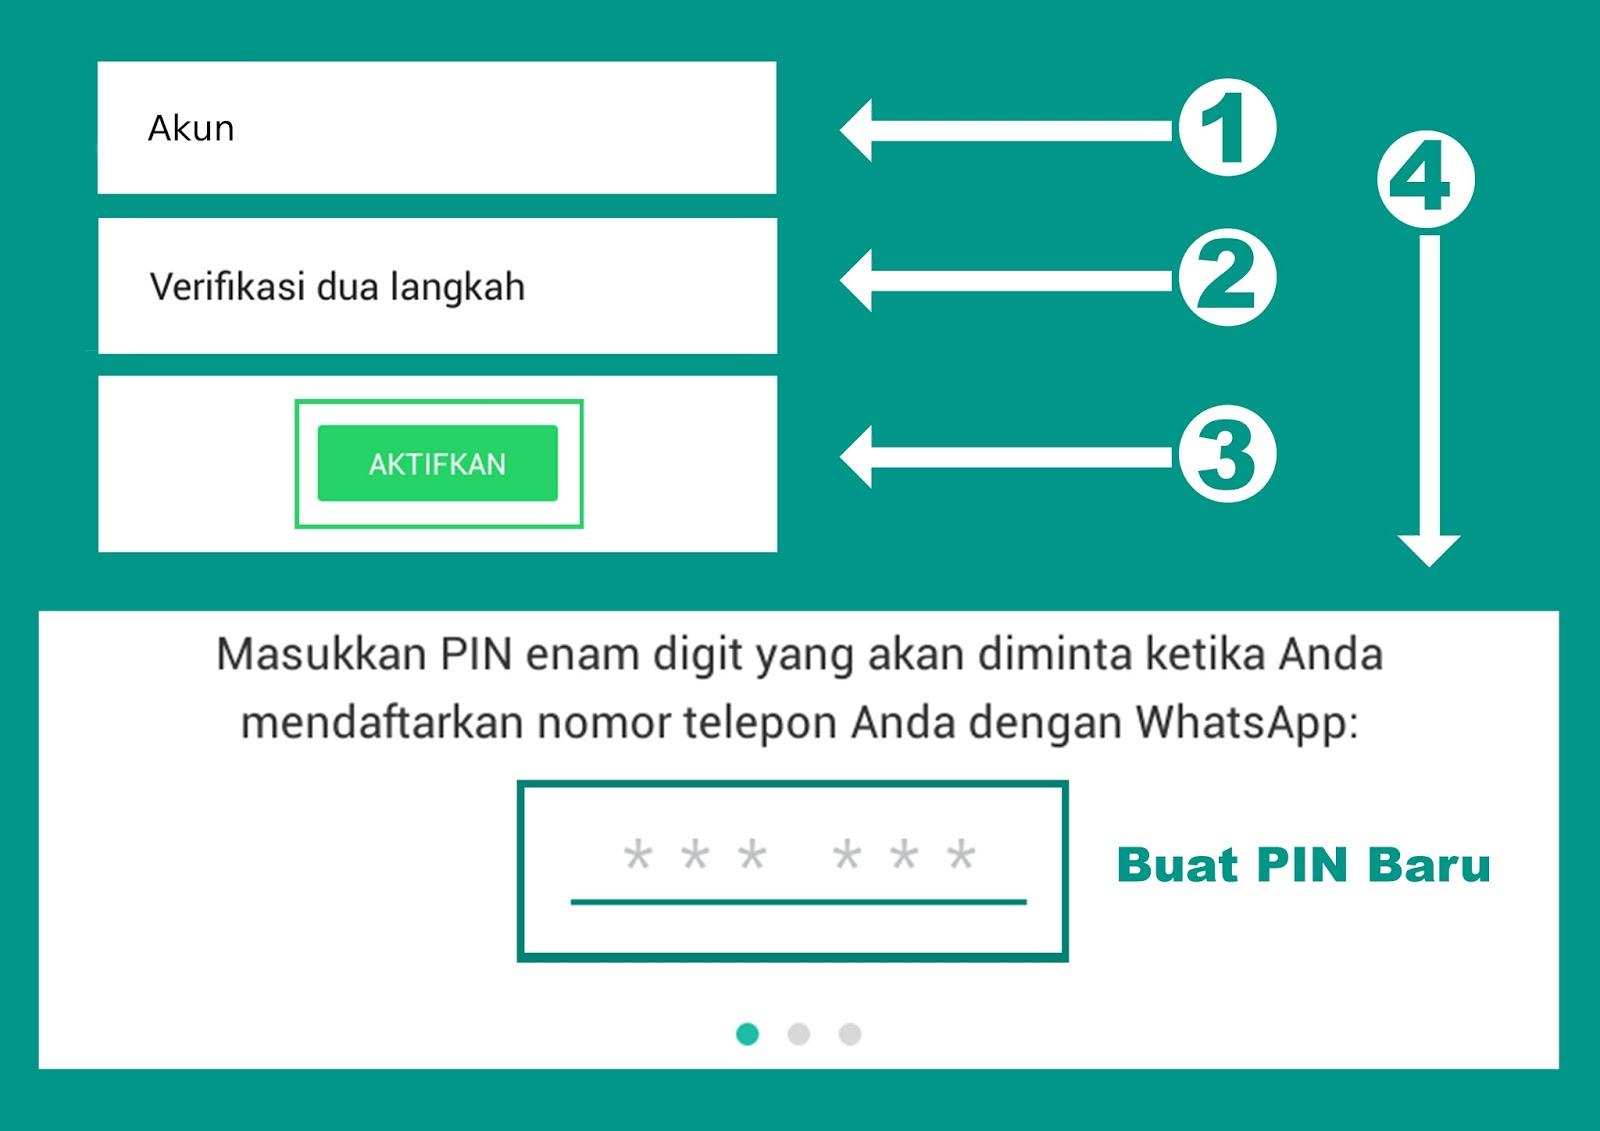 Cara Mengaktifkan Verifikasi Dua Langkah pada Whatsapp